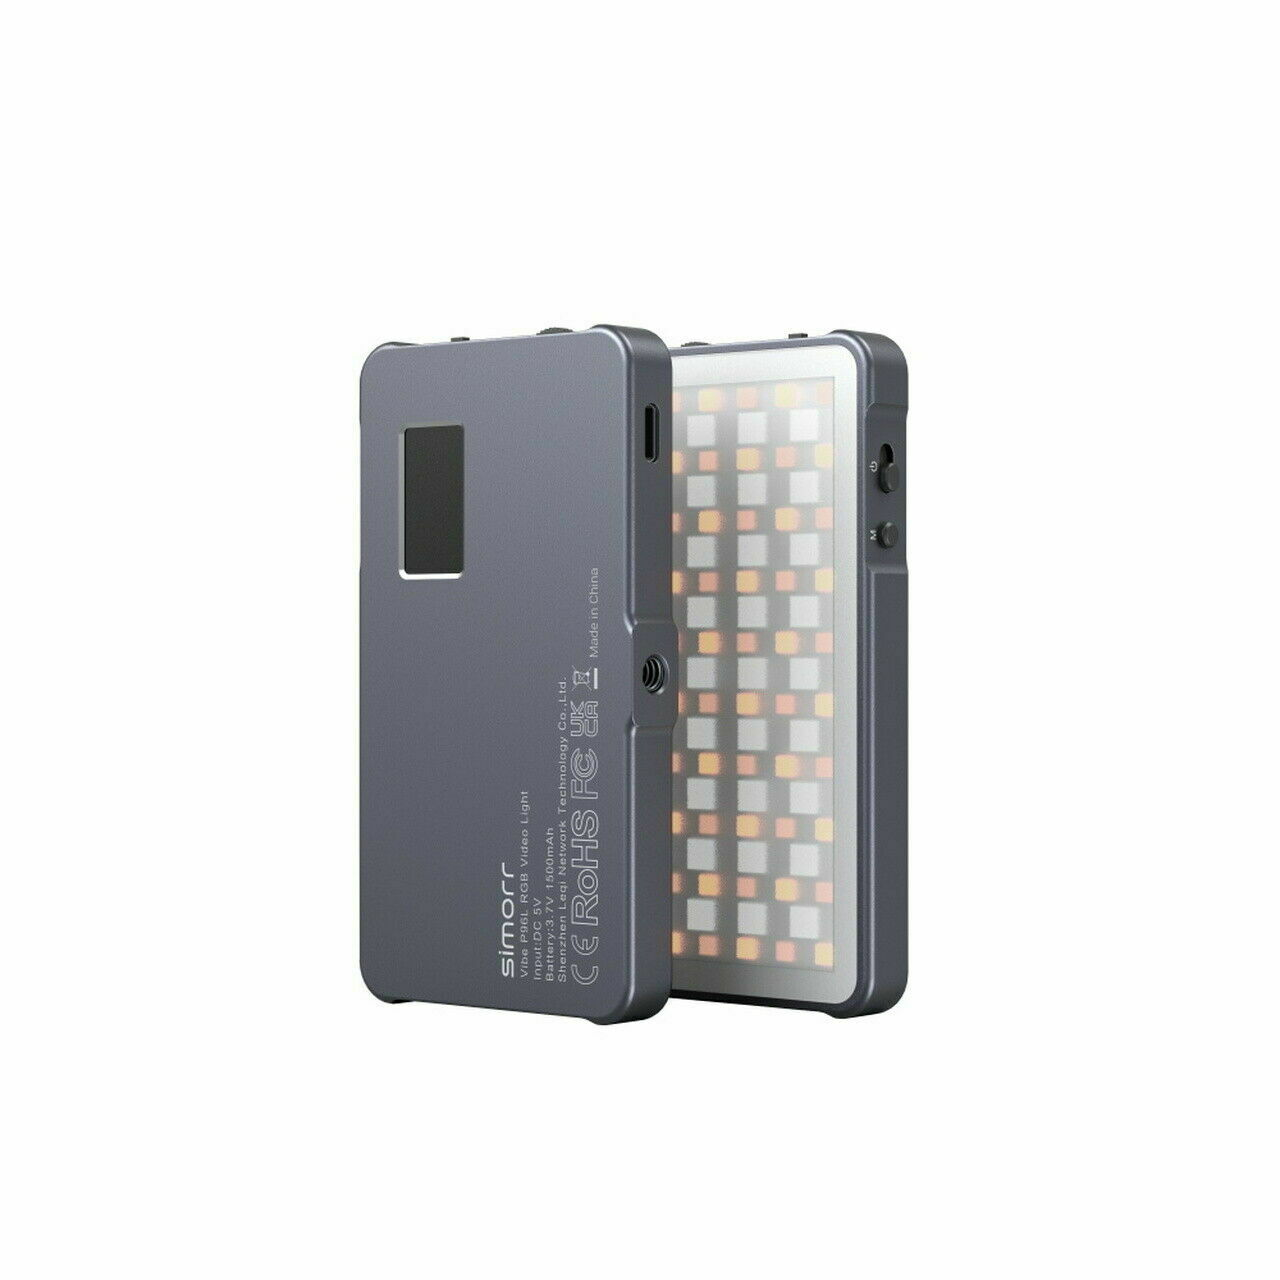 simorr Lightweight Vibe RGB Video Light (21 kinds of light effects) 3489 P96L